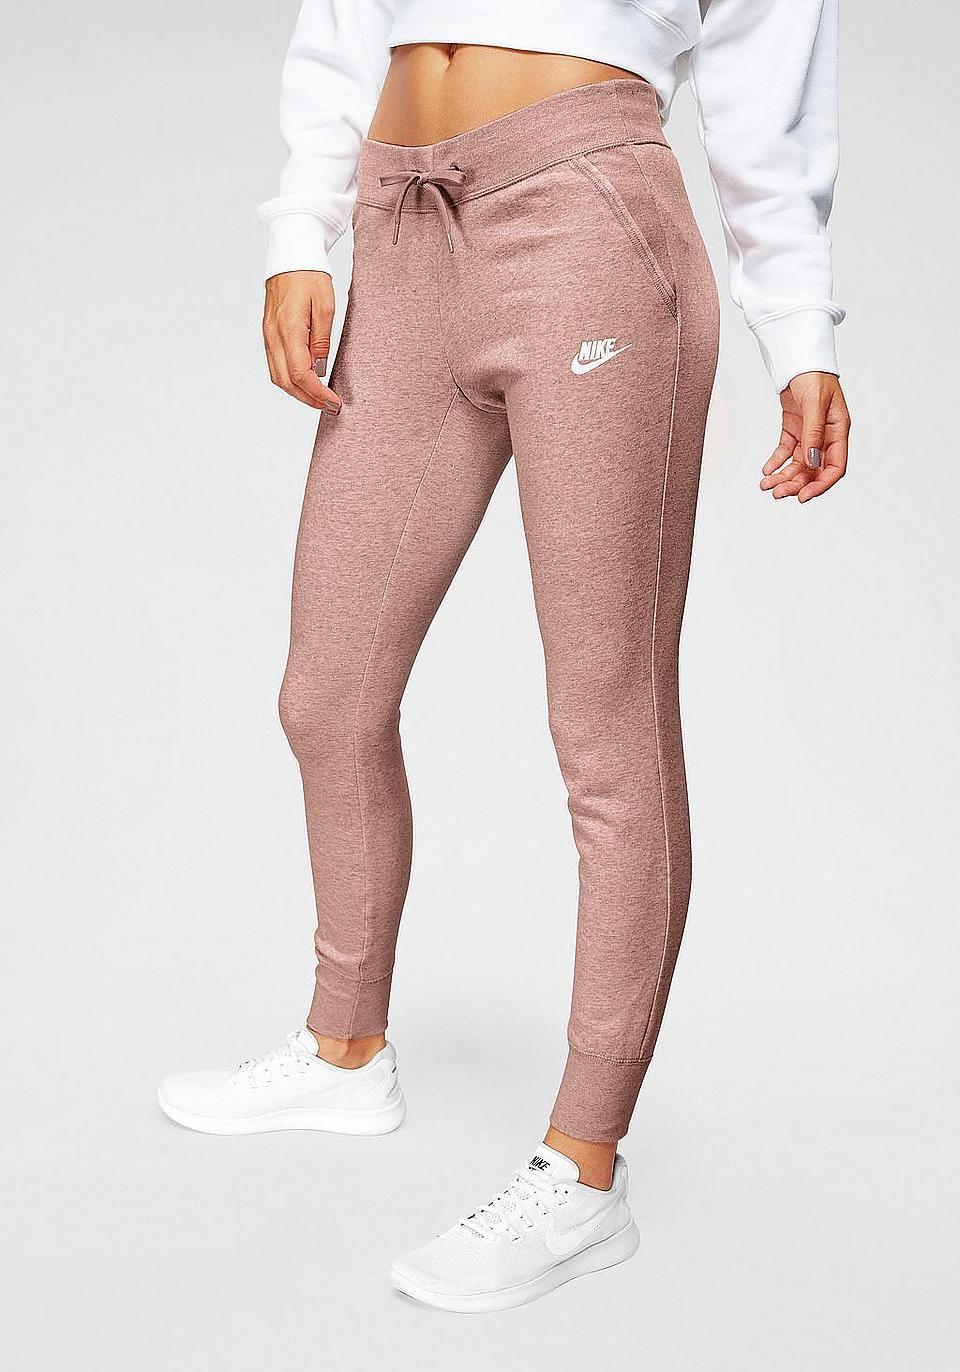 best price great fit good texture Nike Sportswear Jogginghose »NSW PANT FLEECE TIGHT« in 2019 ...